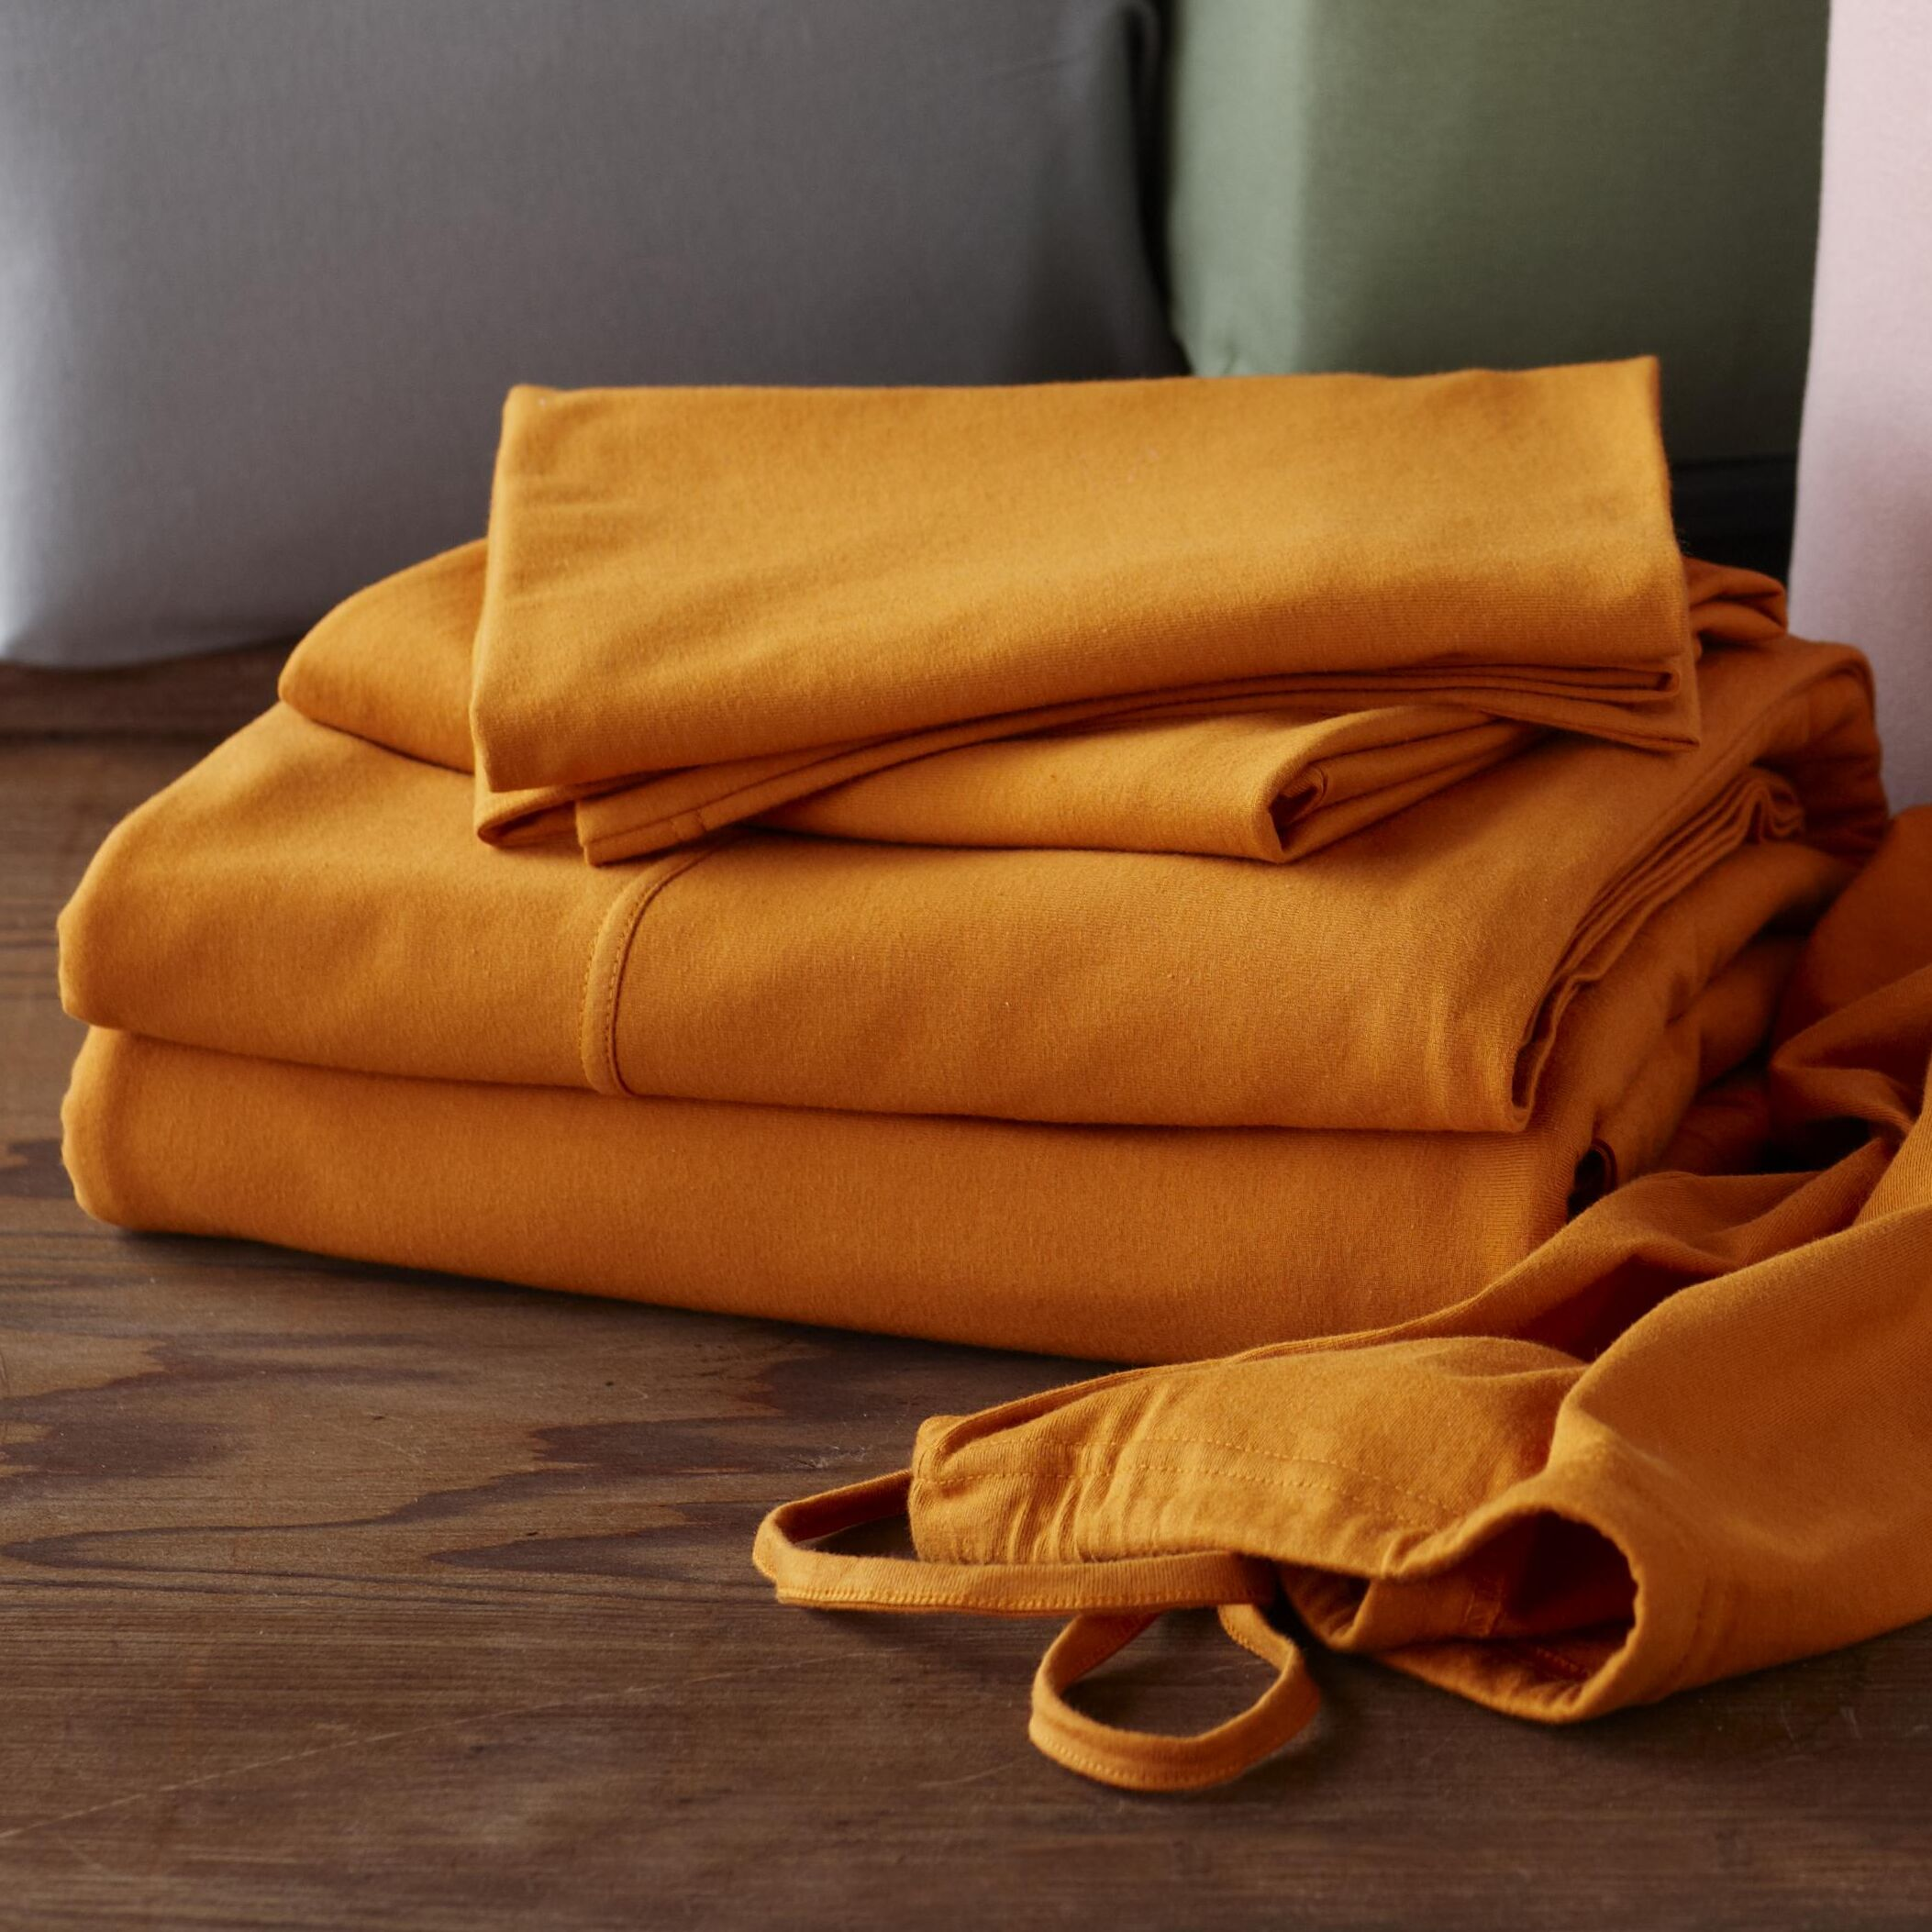 Jersey 4 Piece 100% Cotton Sheet Set Color: Natural, Size: Queen